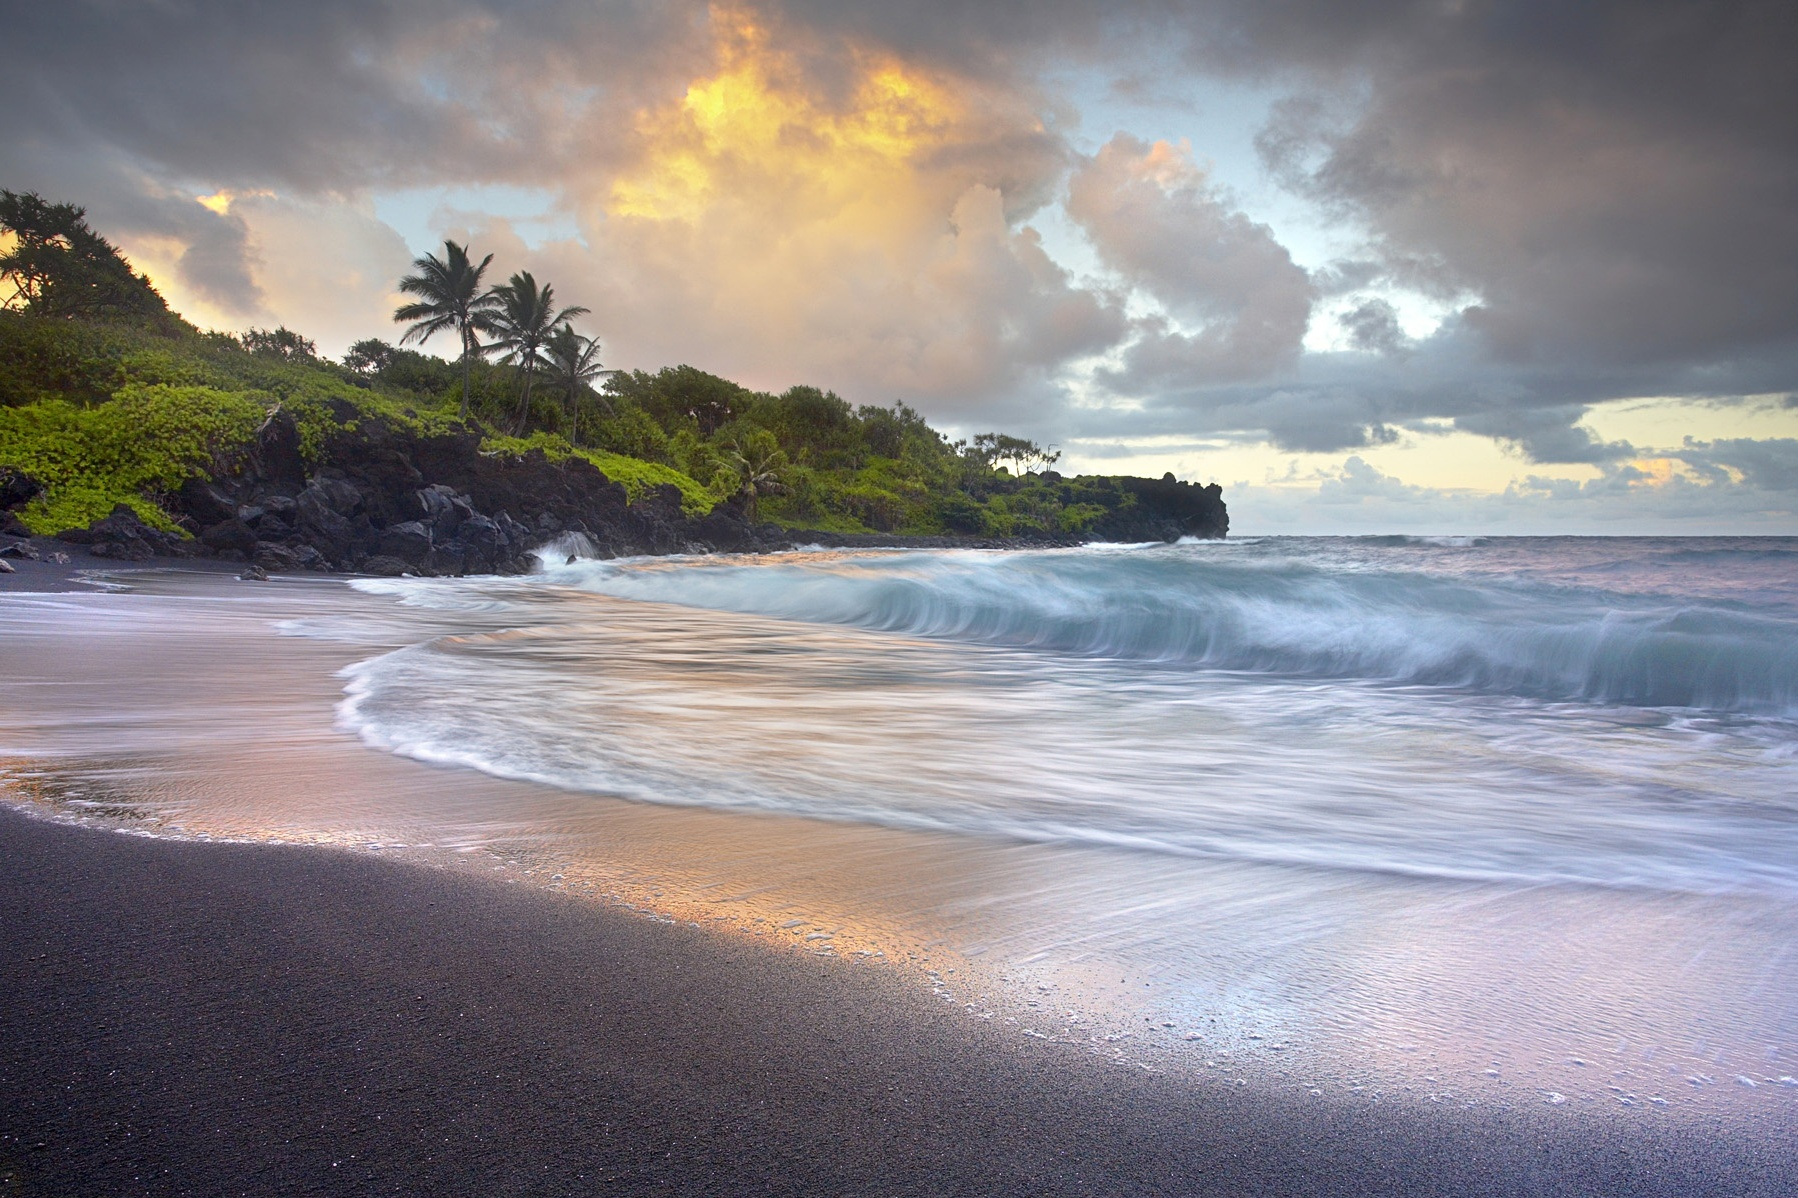 Waves-crashing-black-sand-beach-Hawaii